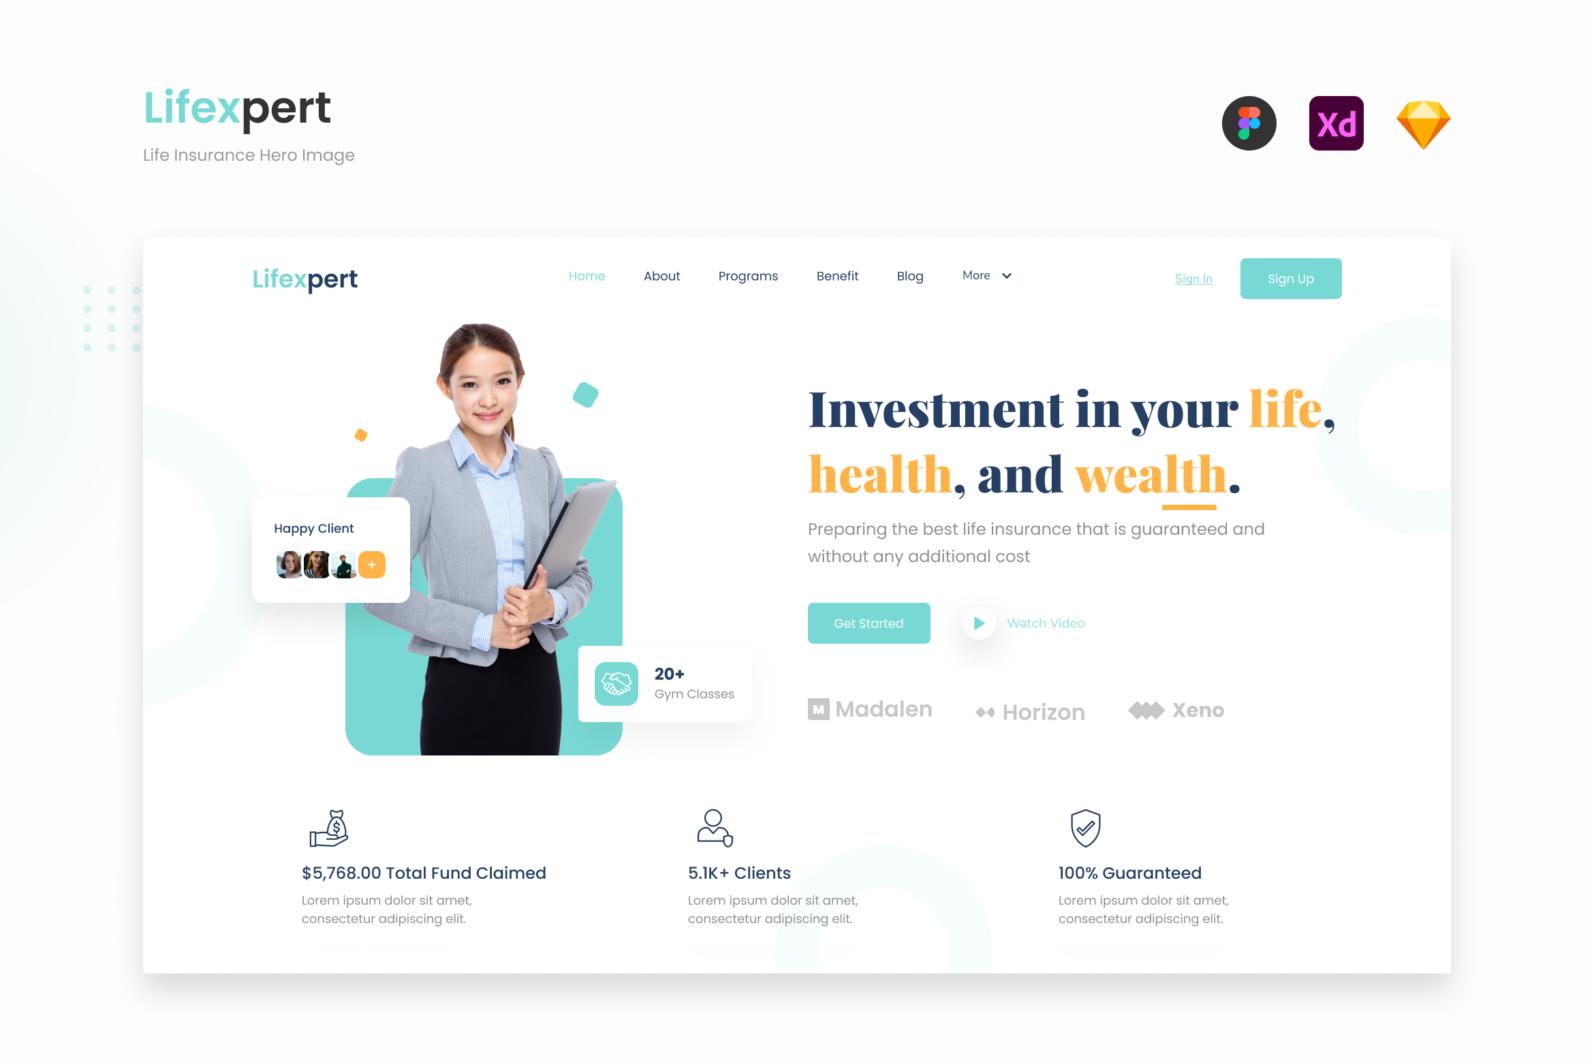 Lifexpert - Modern Life Insurance Website Landing - Cover 1 -